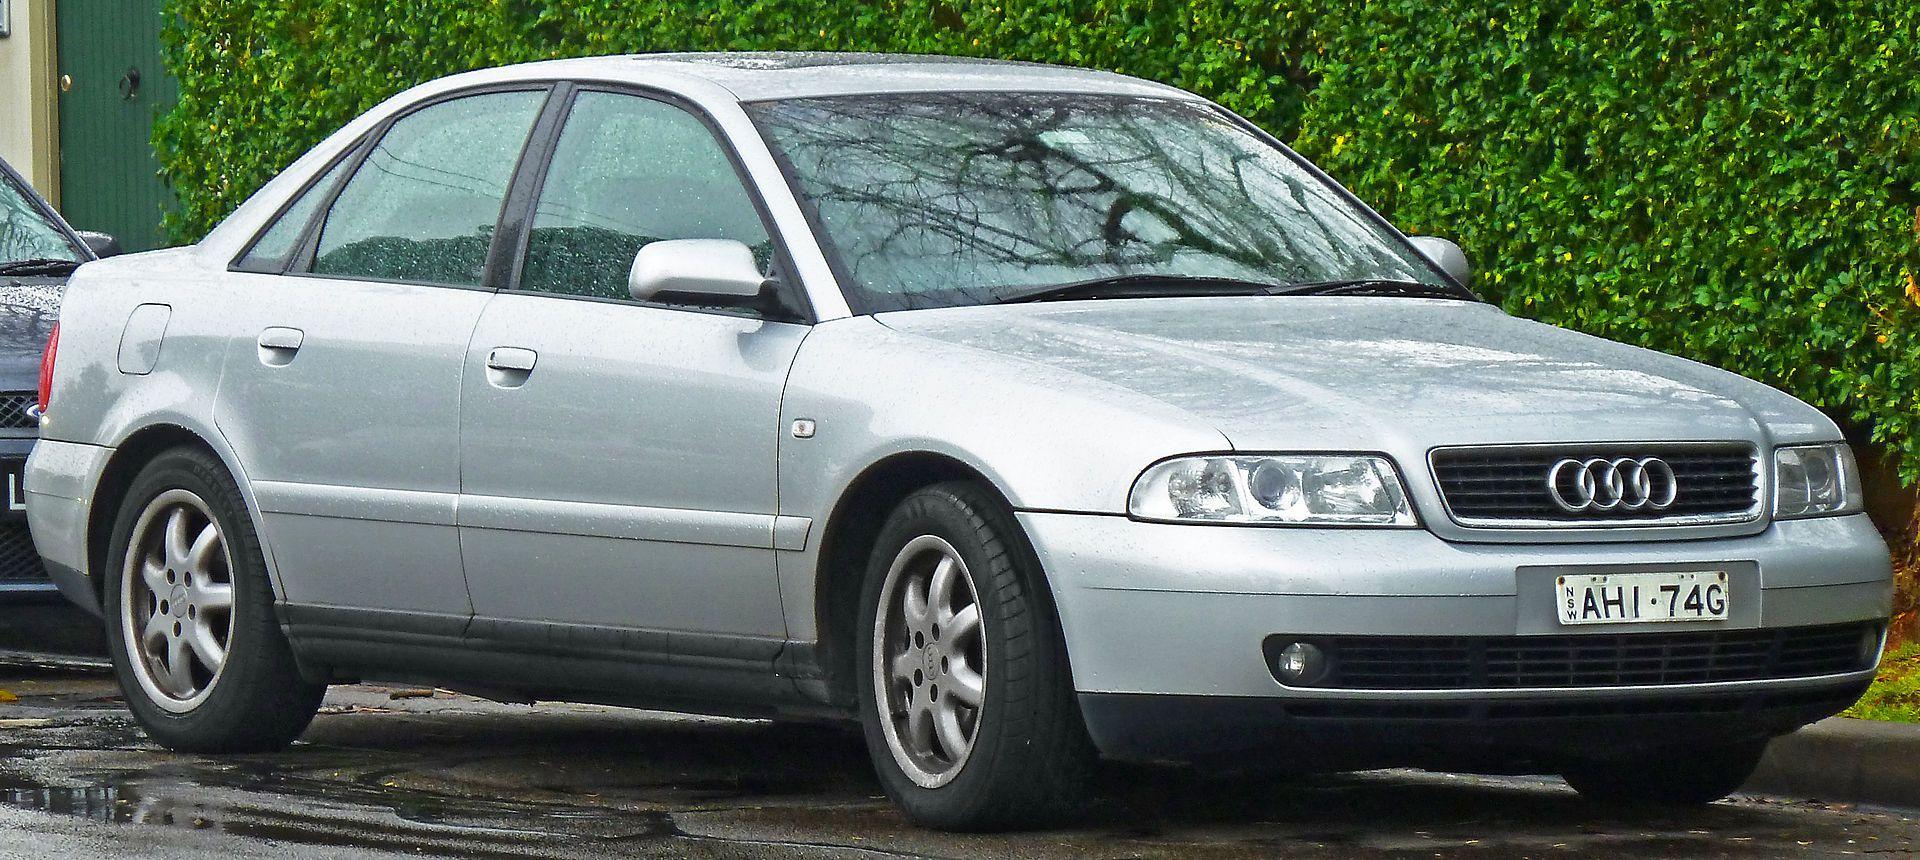 01 Audi A4